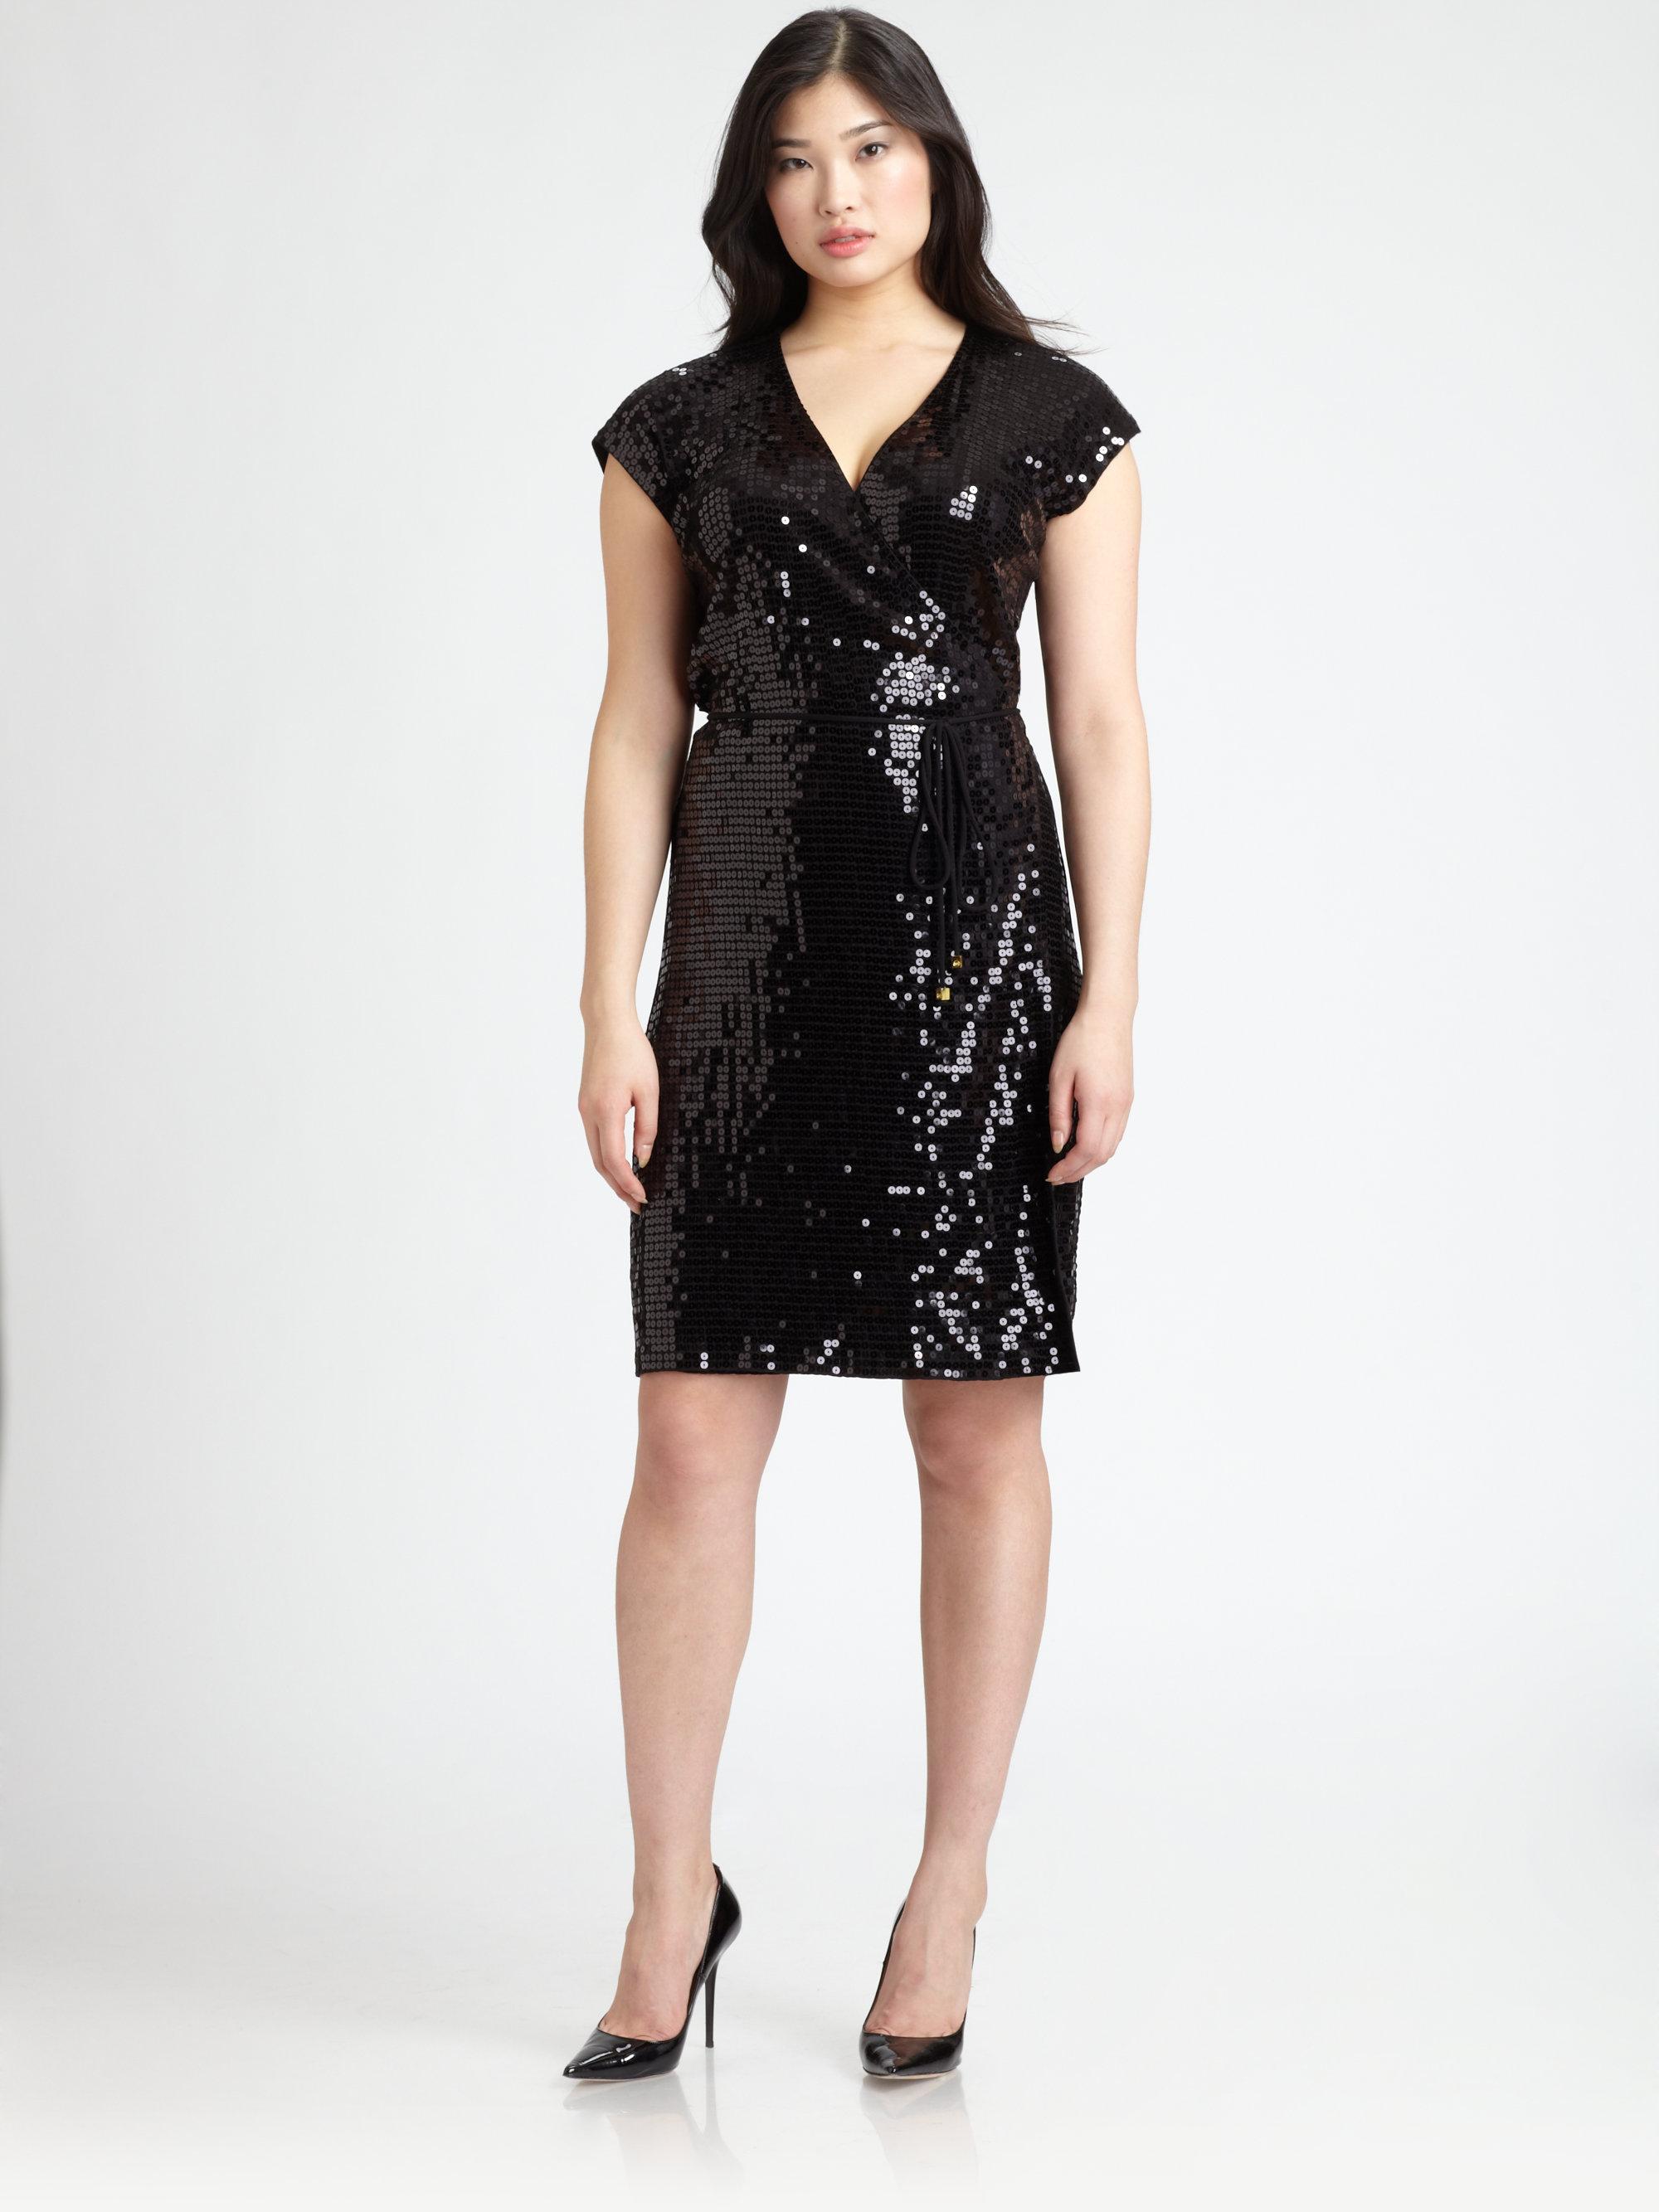 8051908a903 MICHAEL Michael Kors Sequin Wrap Dress in Black - Lyst